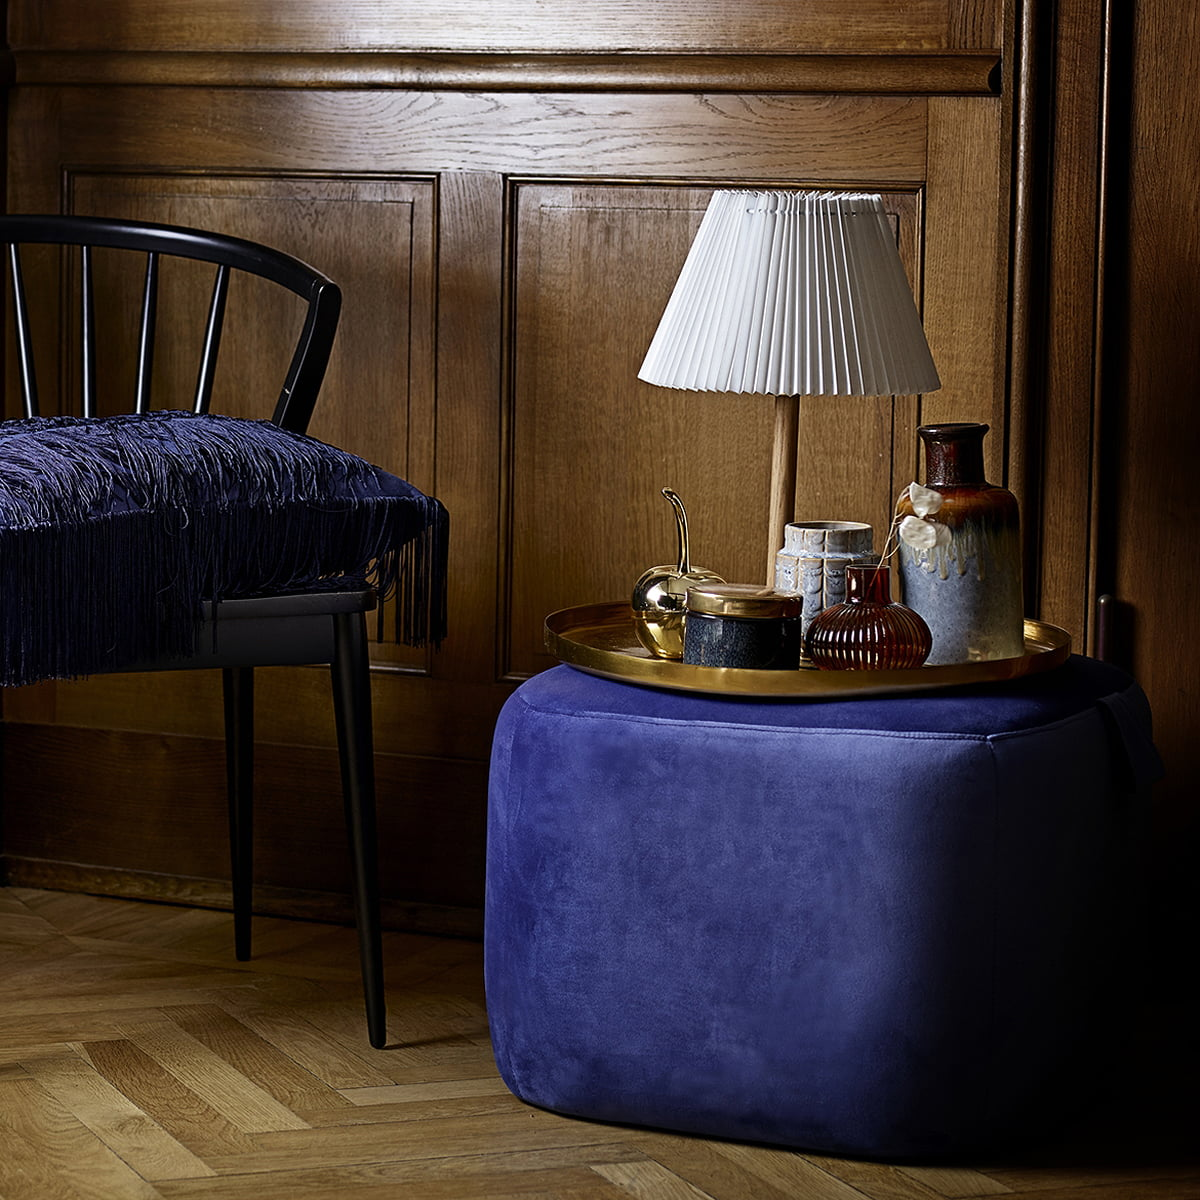 deko kirsche von bloomingville. Black Bedroom Furniture Sets. Home Design Ideas